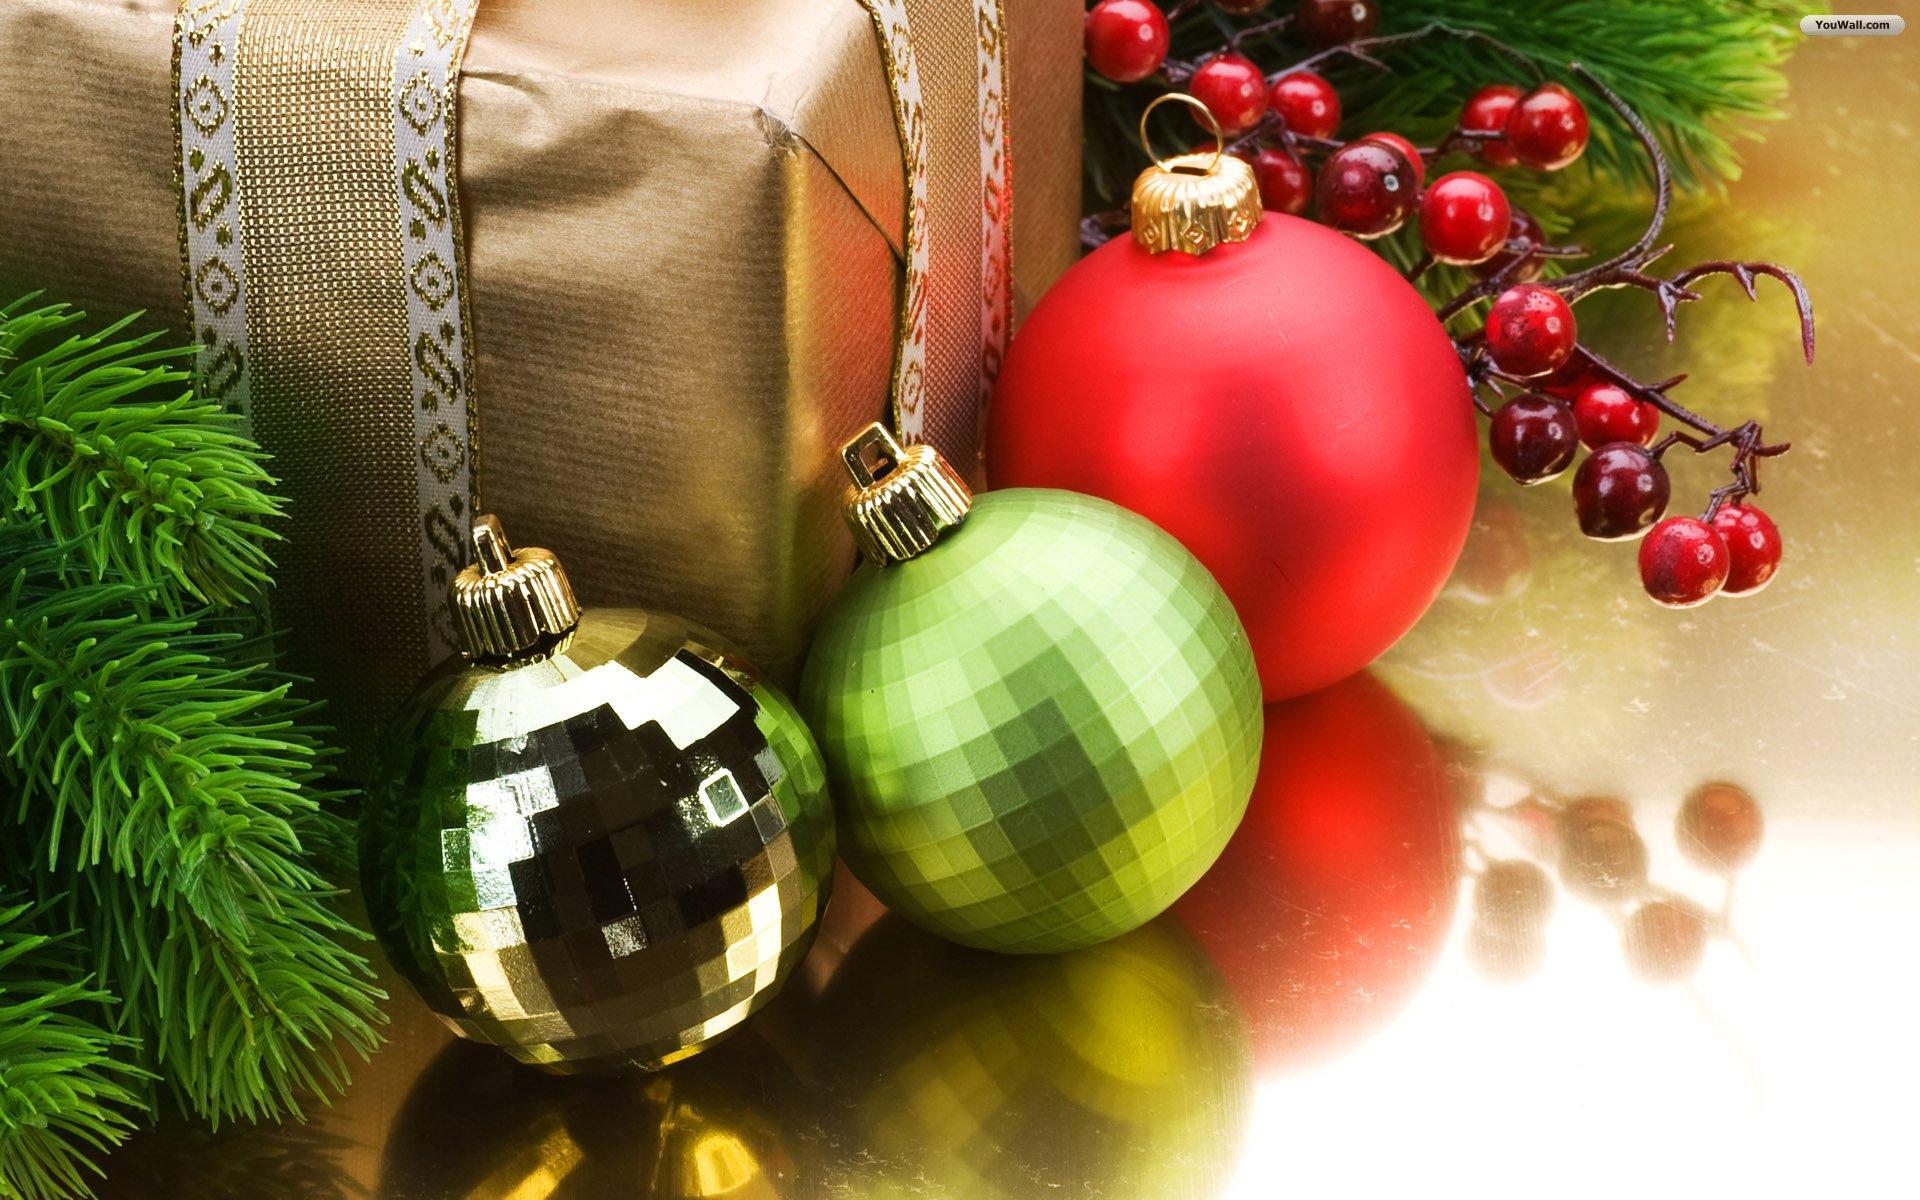 christmas_ornaments_wallpaper_6baf9